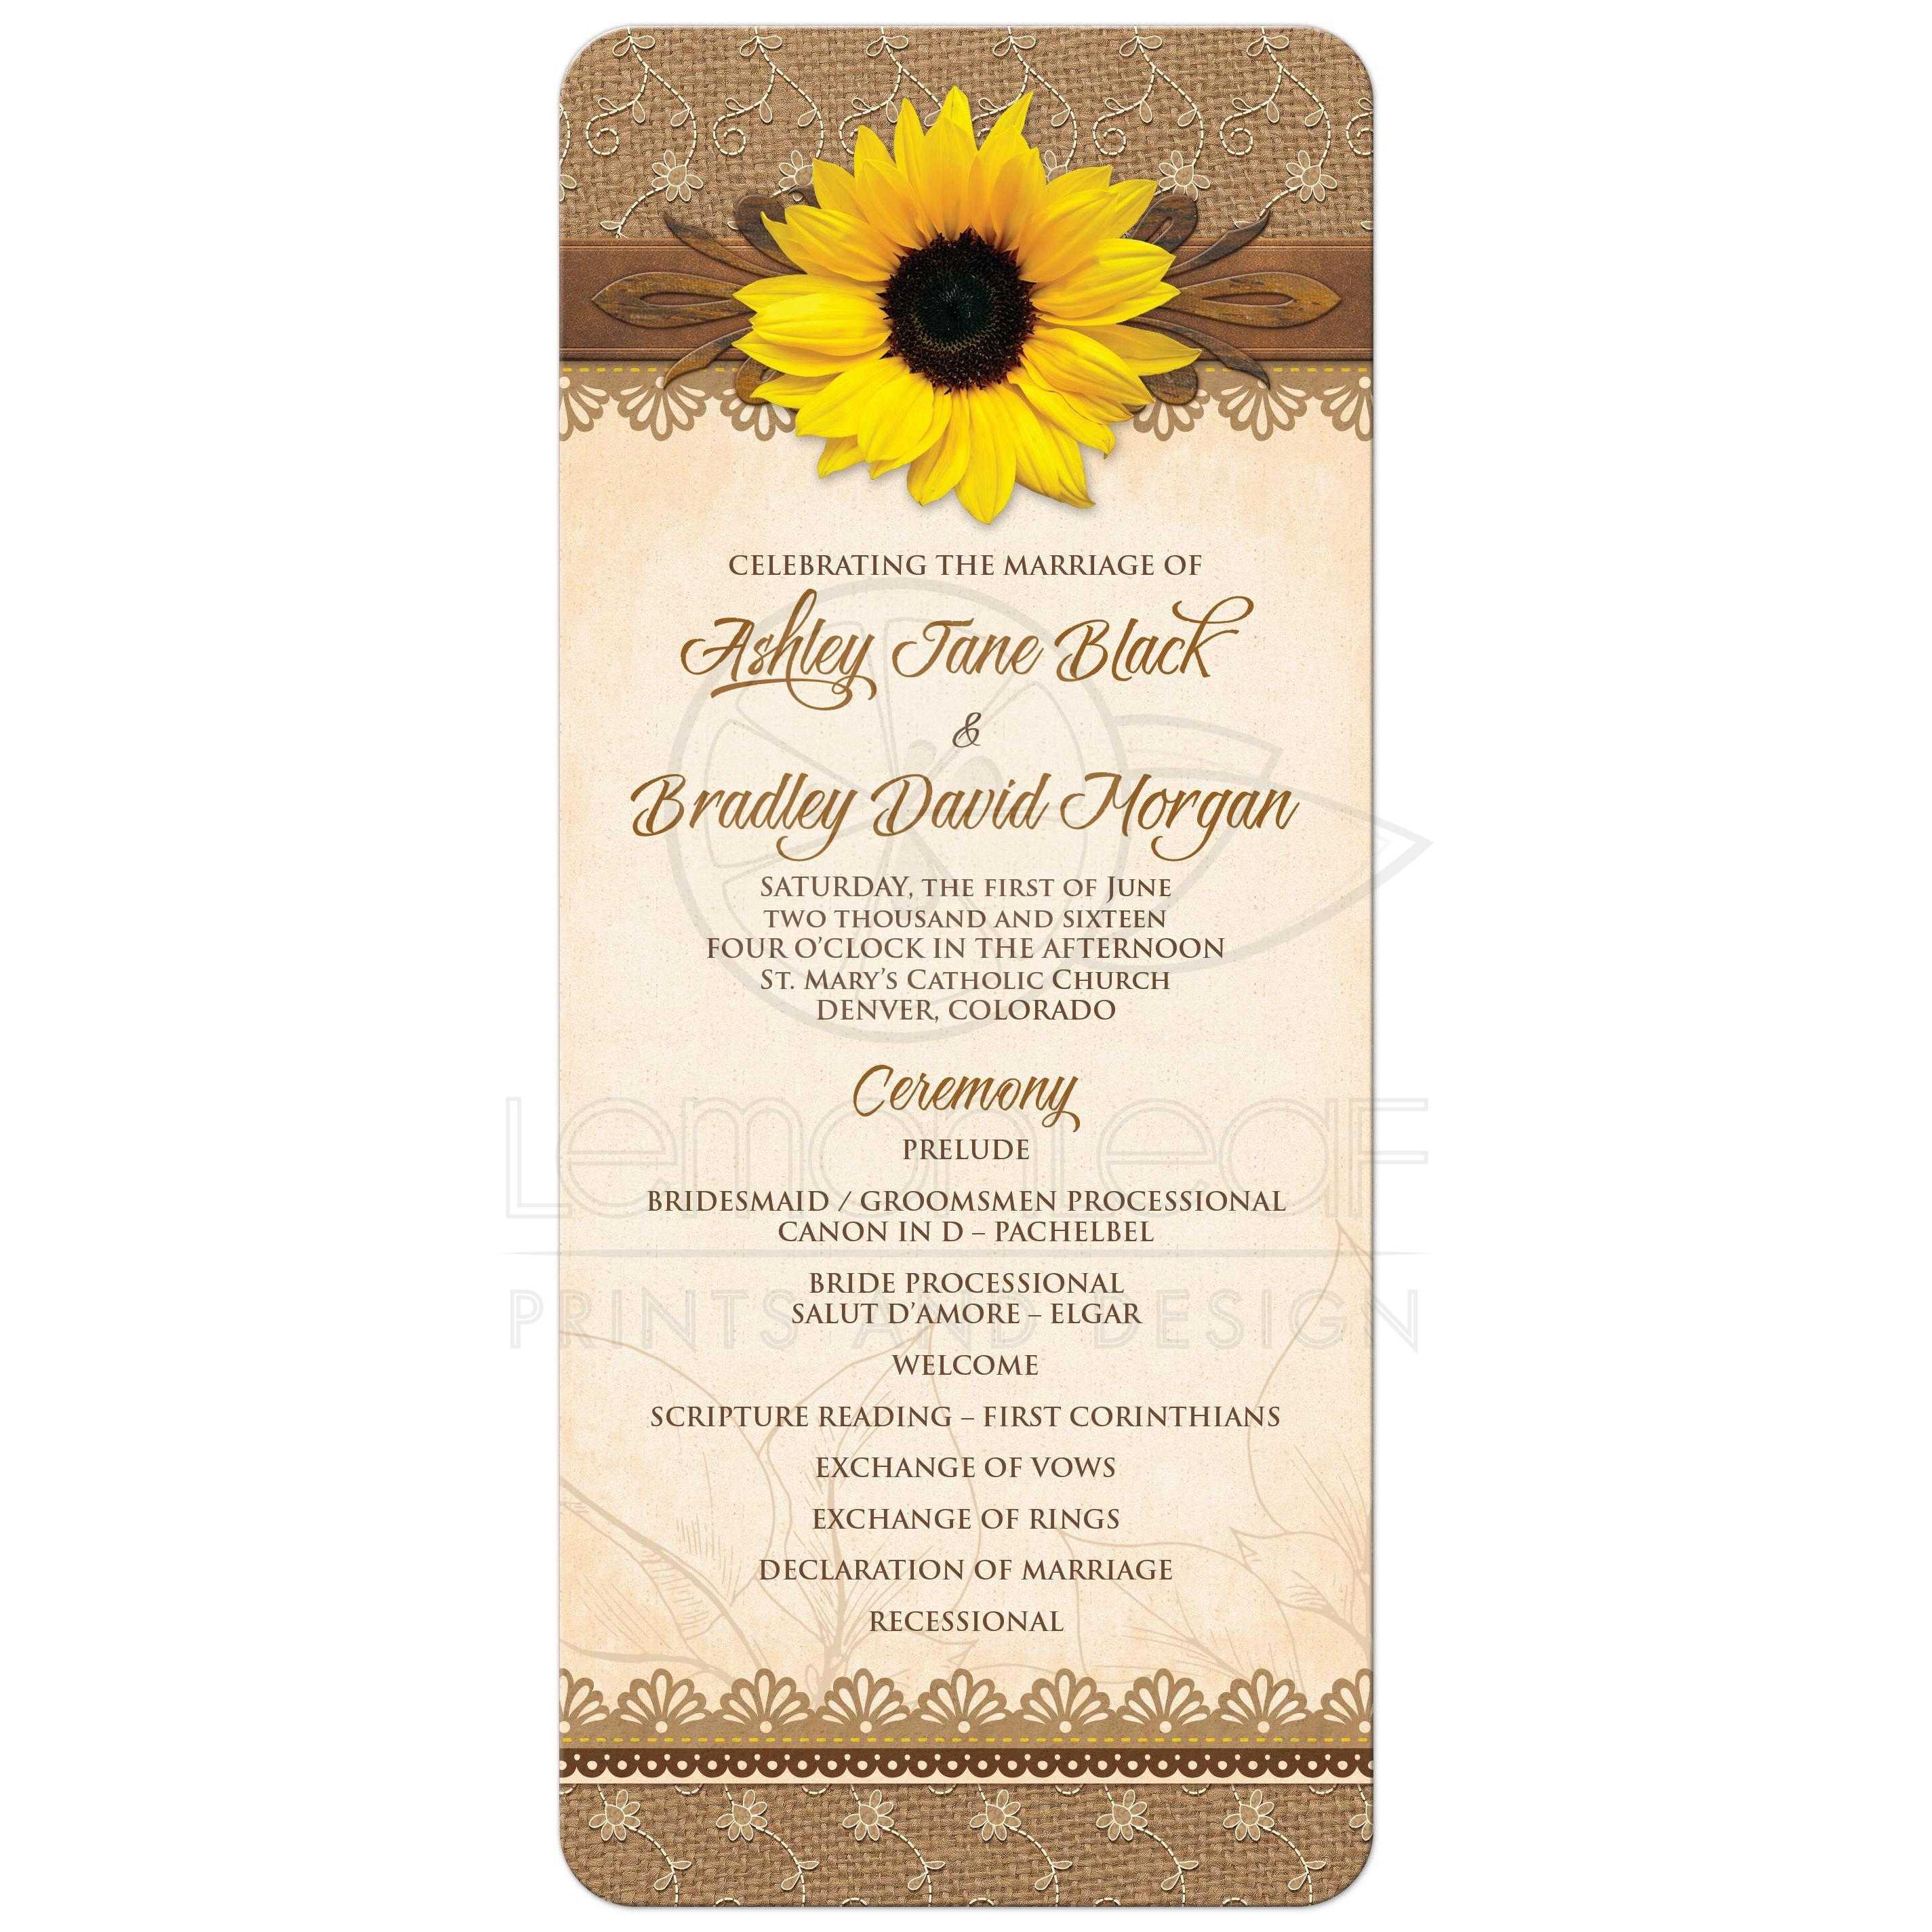 wedding program rustic sunflower burlap lace wood